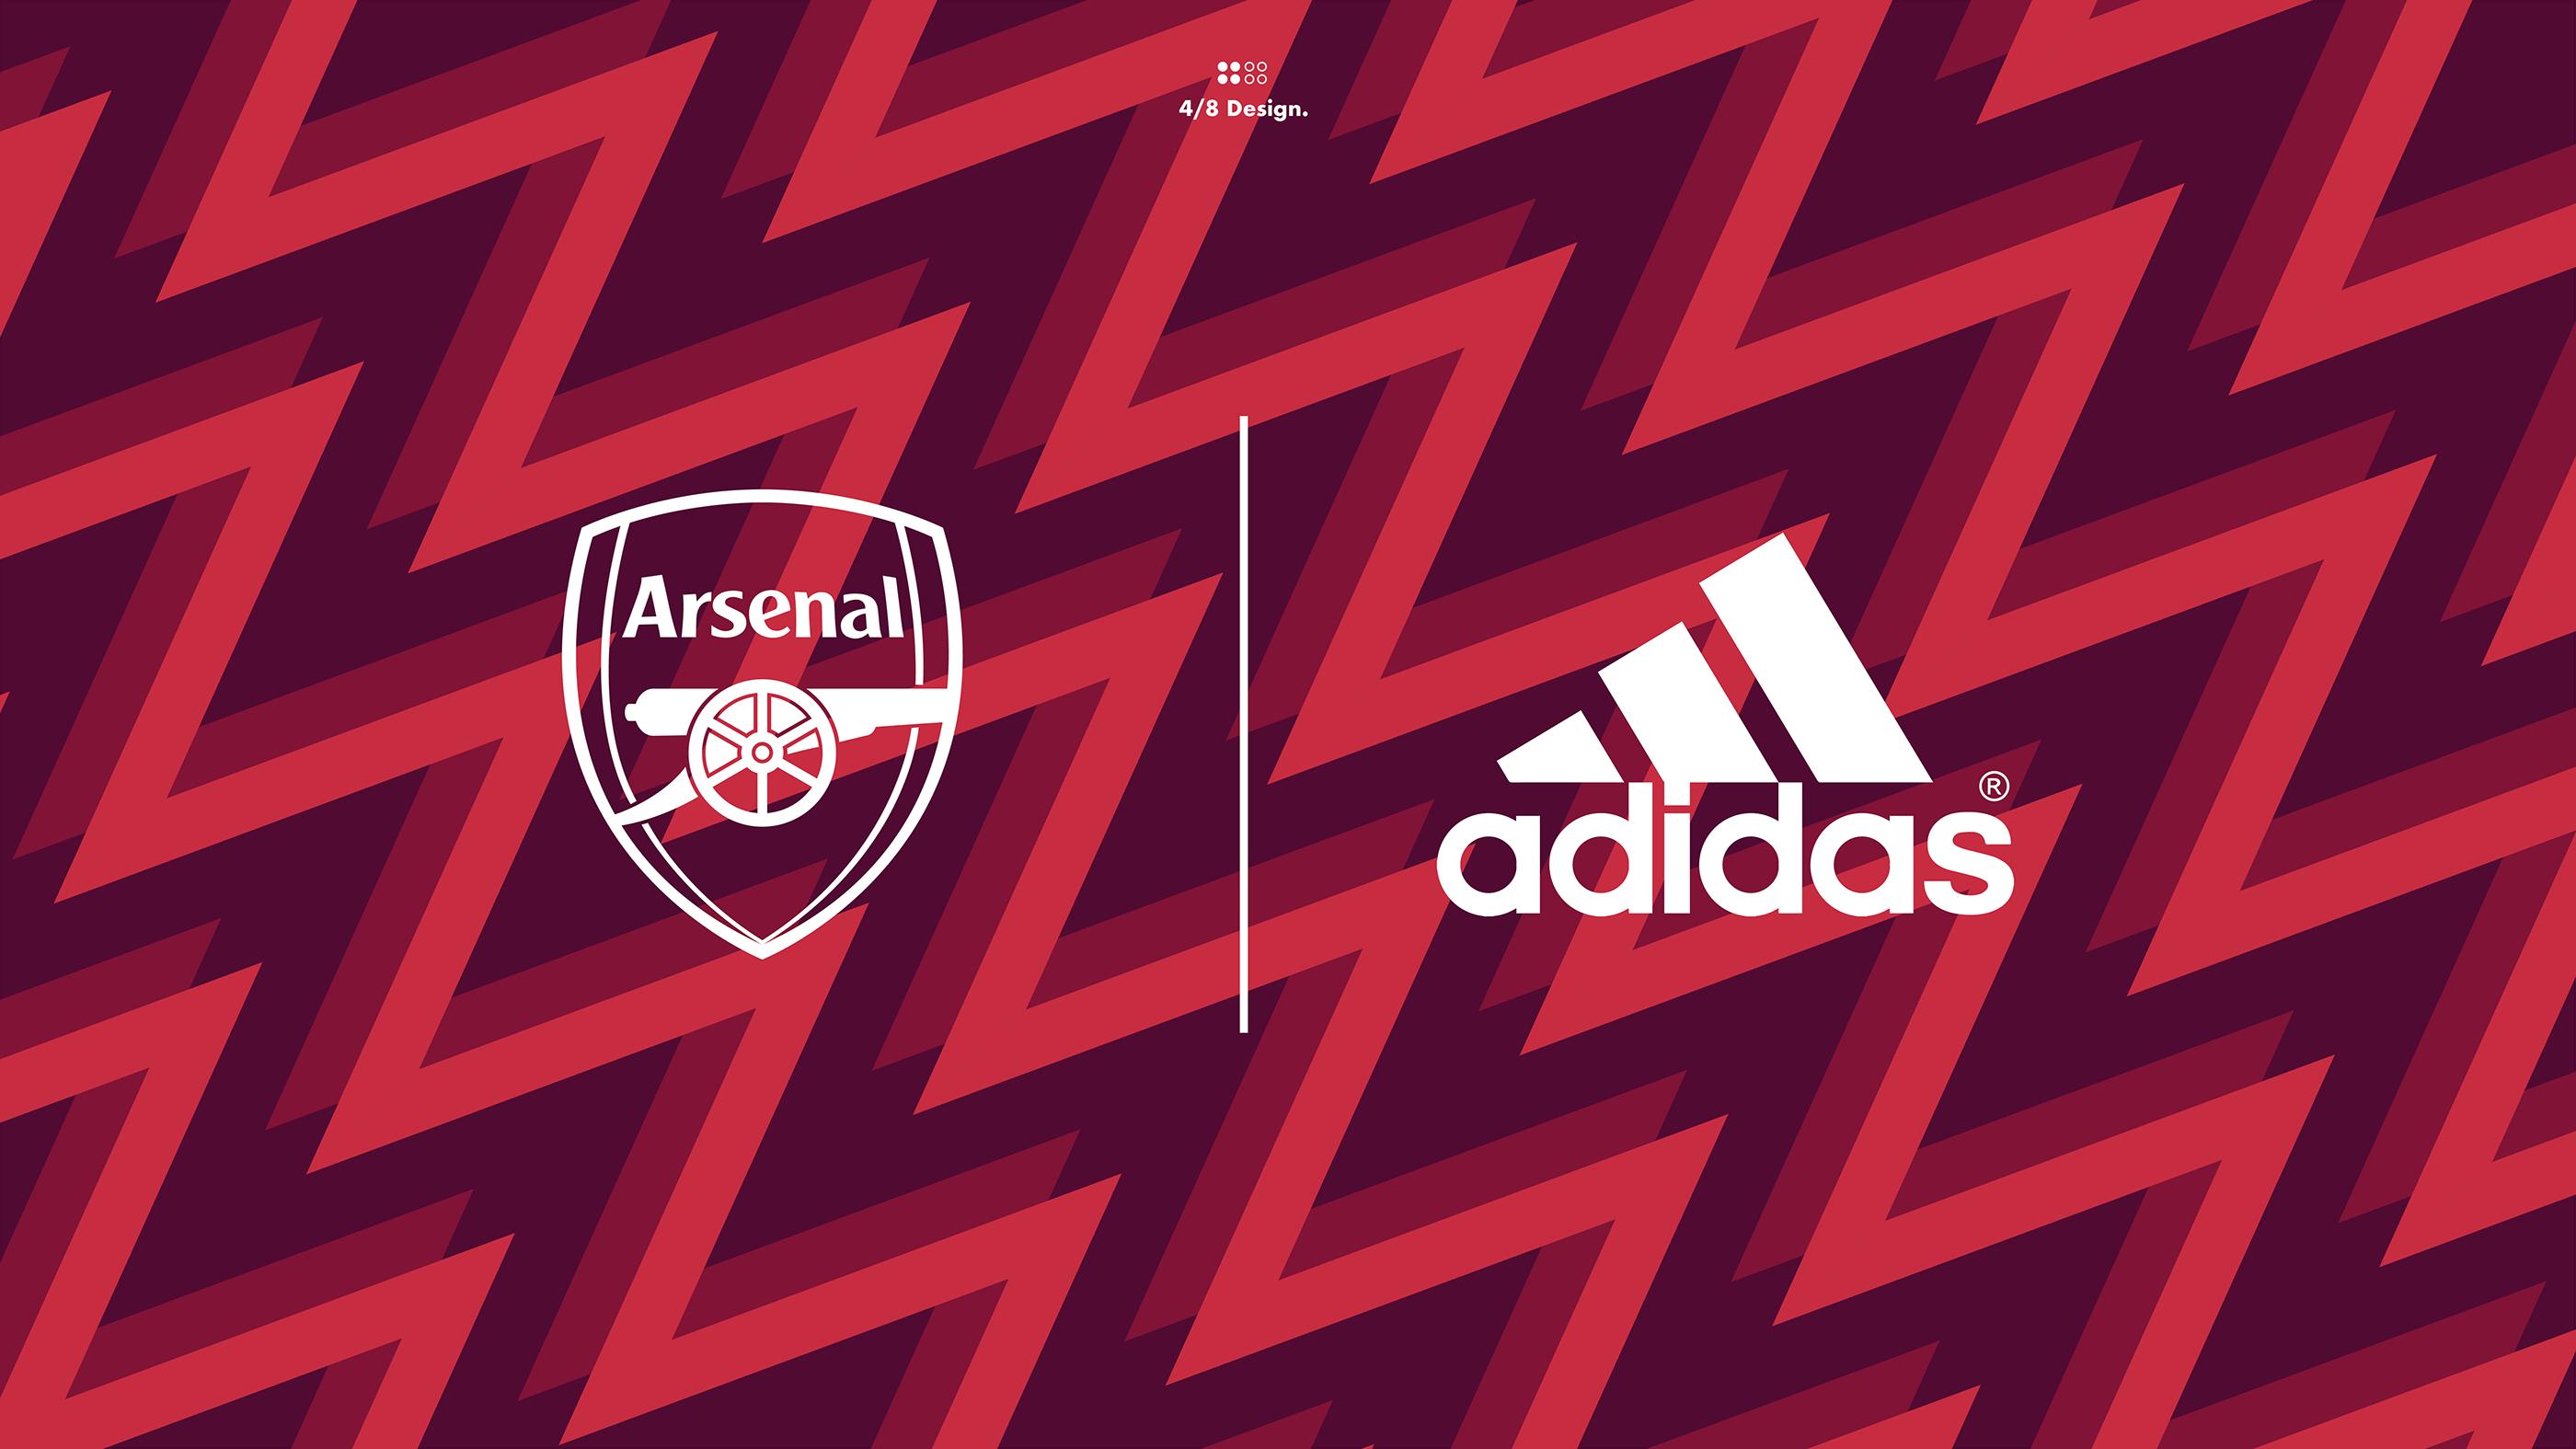 arsenal adidas wallpapers wallpaper cave